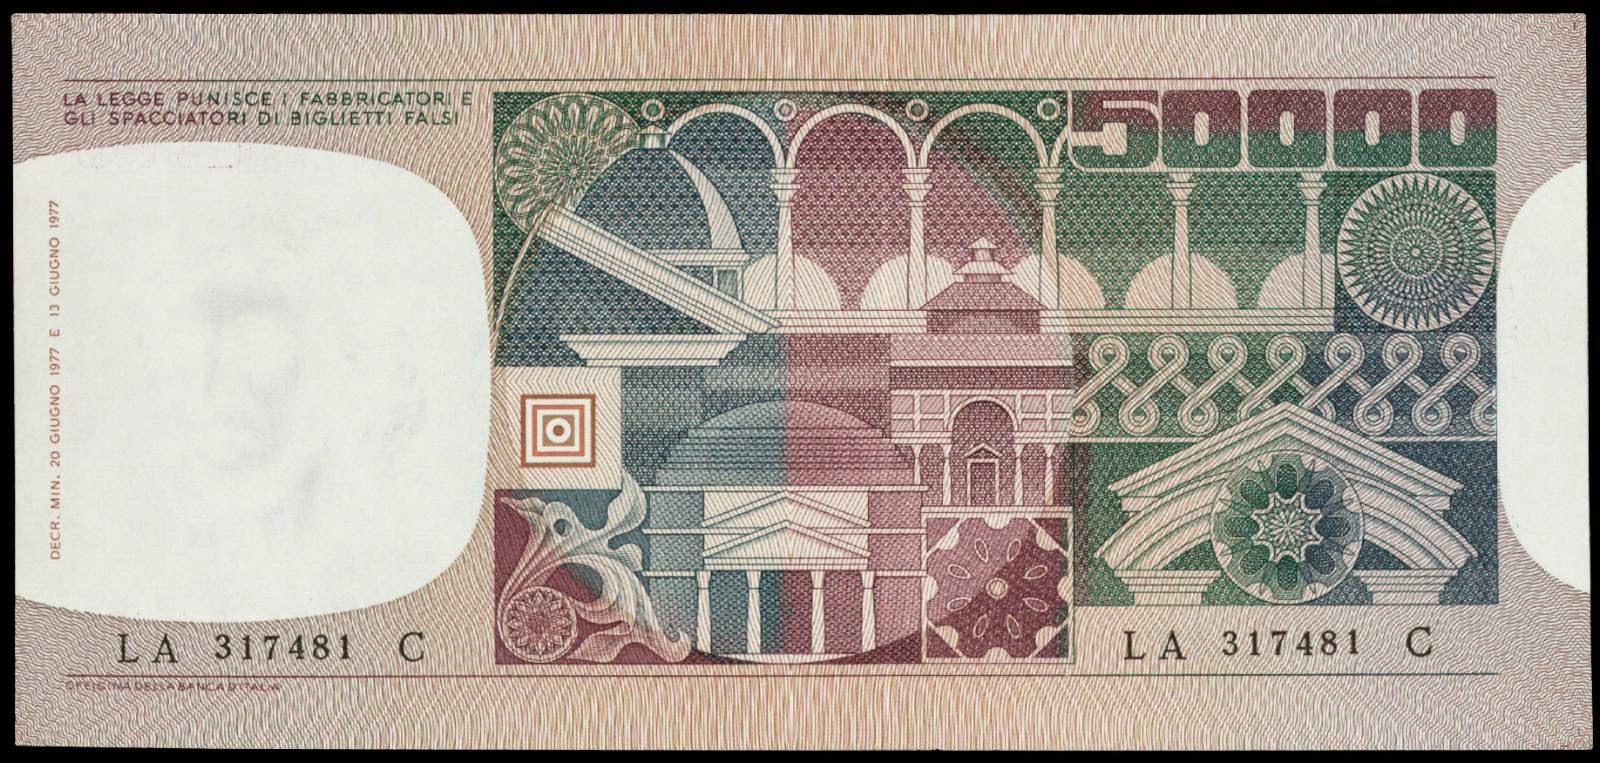 50000 Italian lira banknote